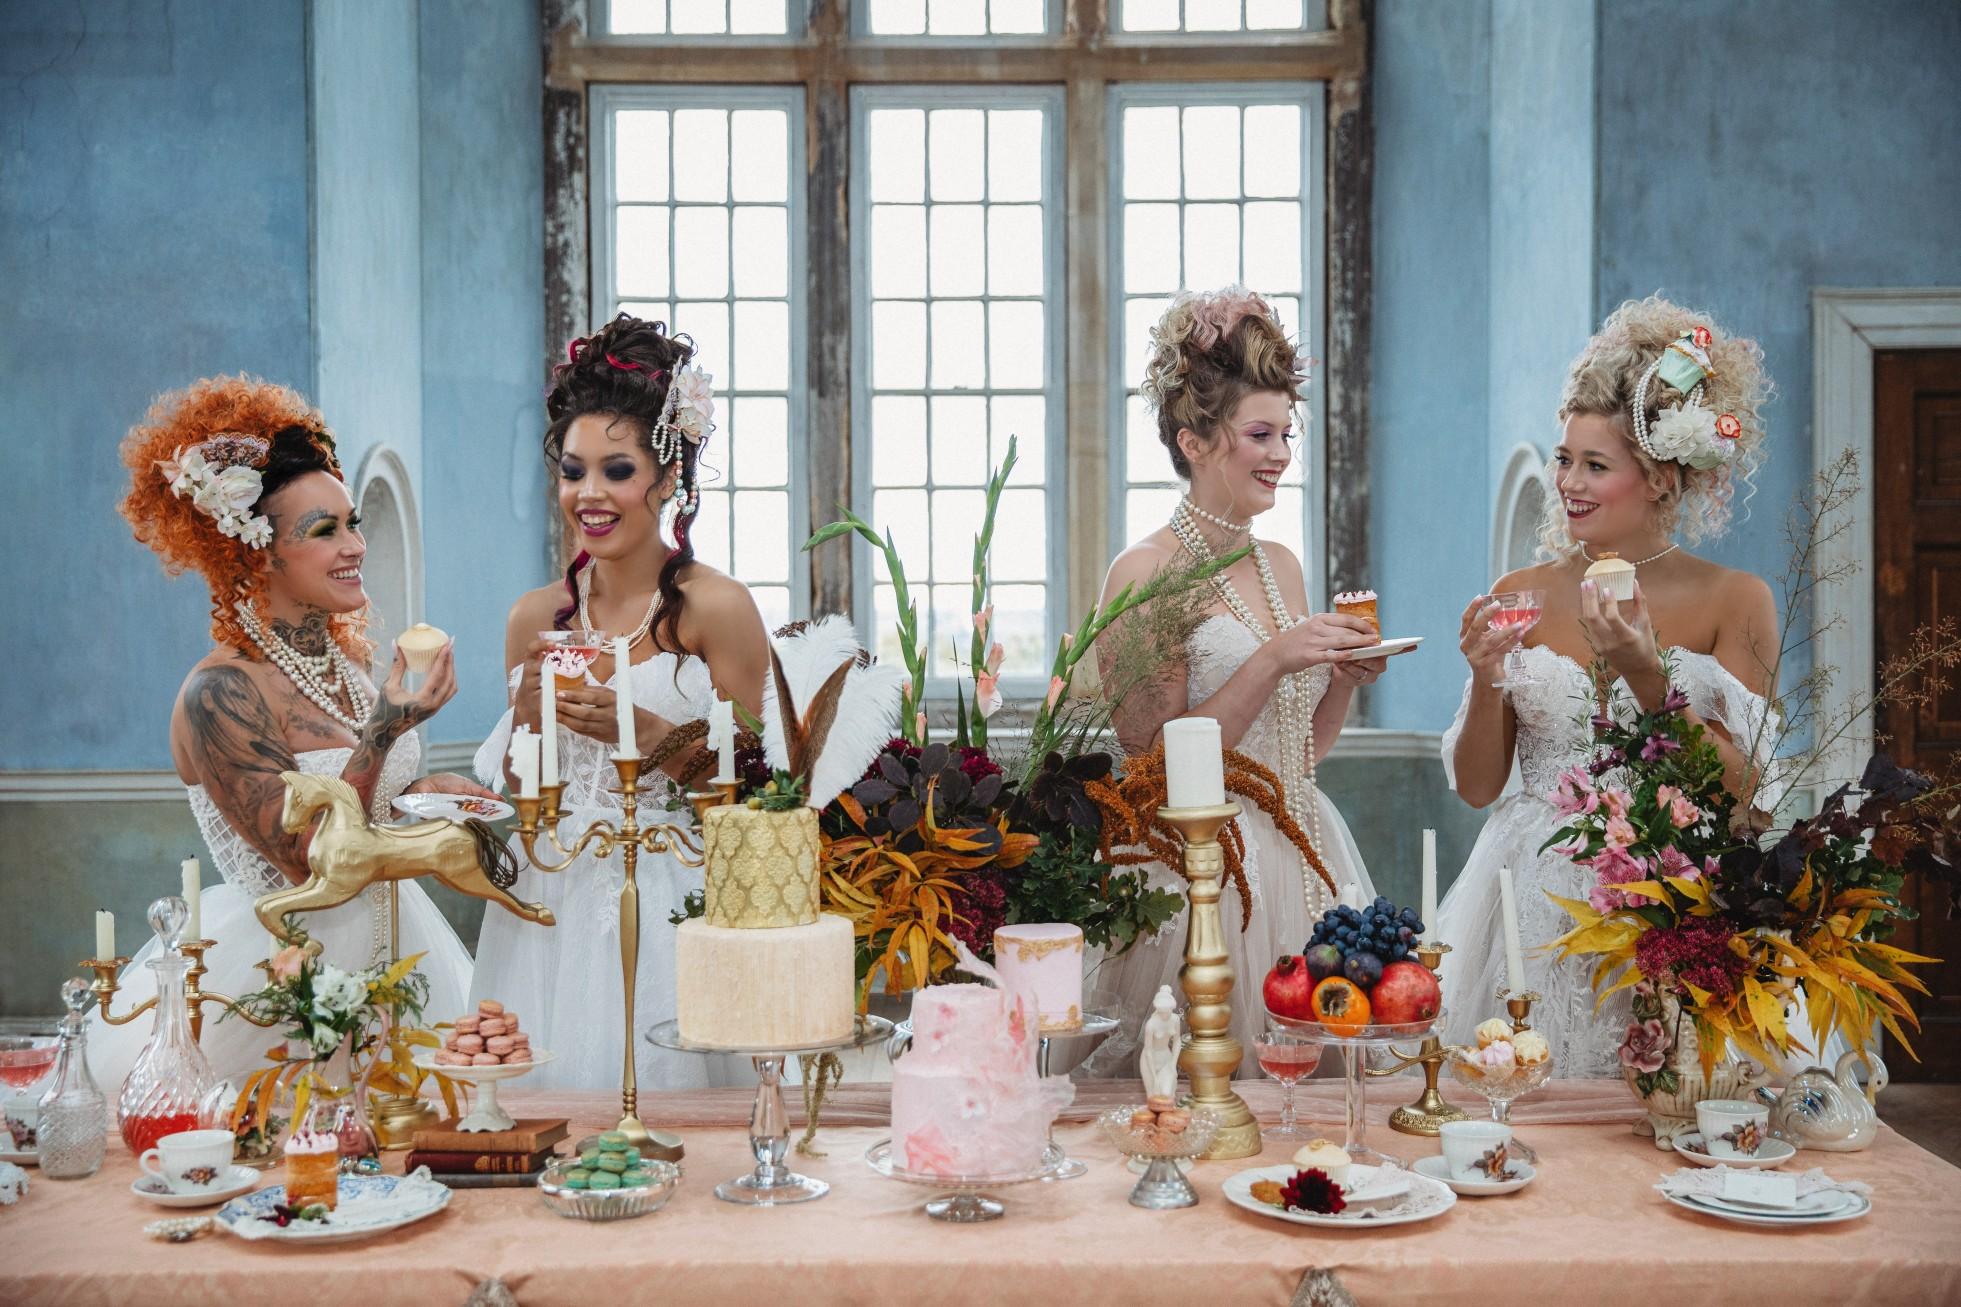 unique pastel wedding - marie antionette wedding - unique bridal look - unique bridal style - themed wedding - wedding dessert table - quirky wedding ideas - fun wedding ideas